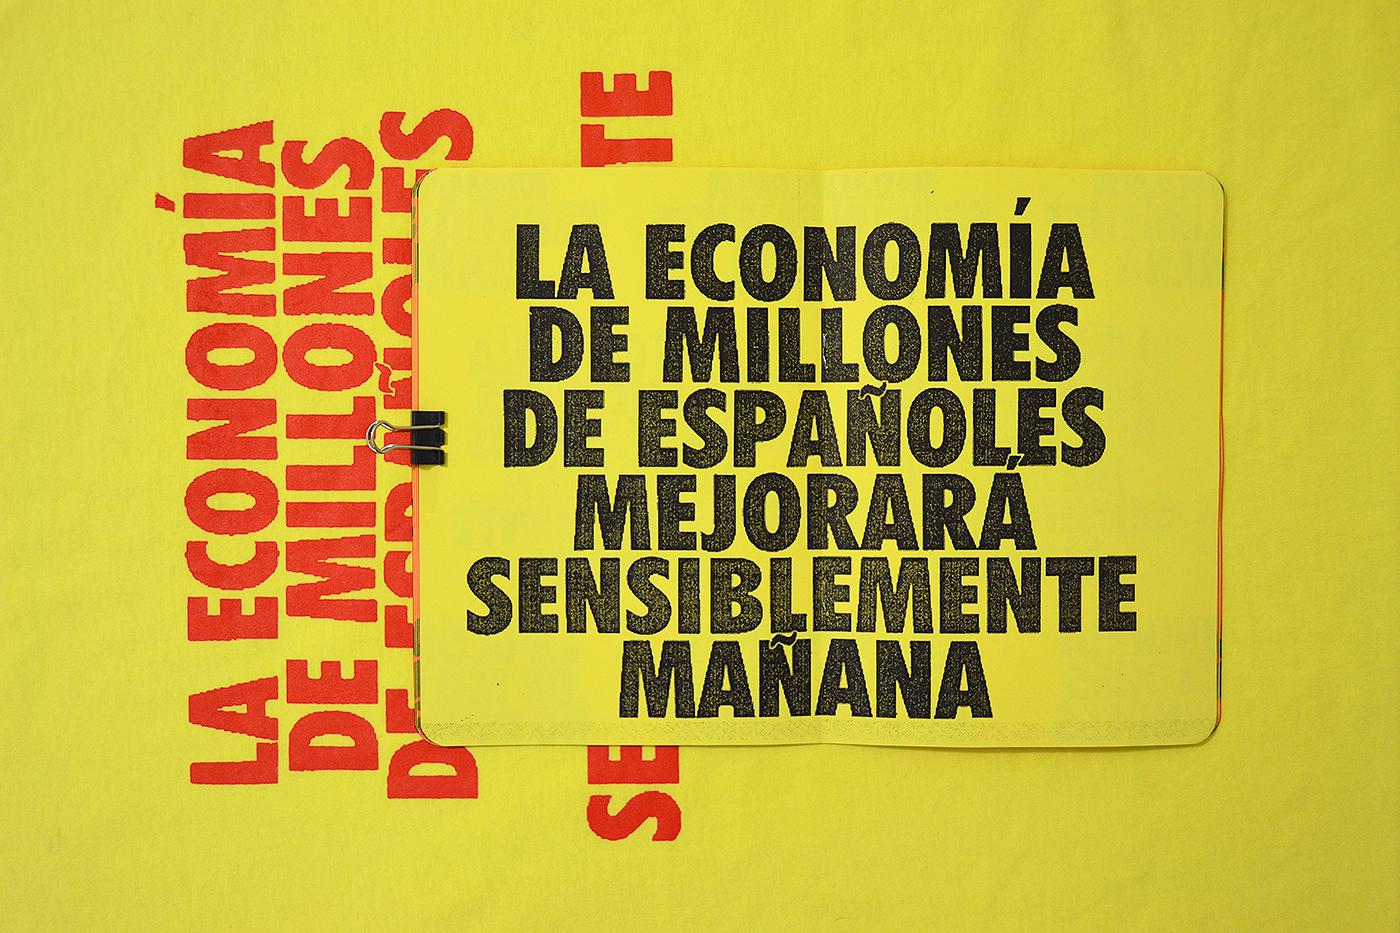 Fotos-Behance-laeconomiadelosespañolesmejorarasensiblementemanana-DSC_0078.jpg